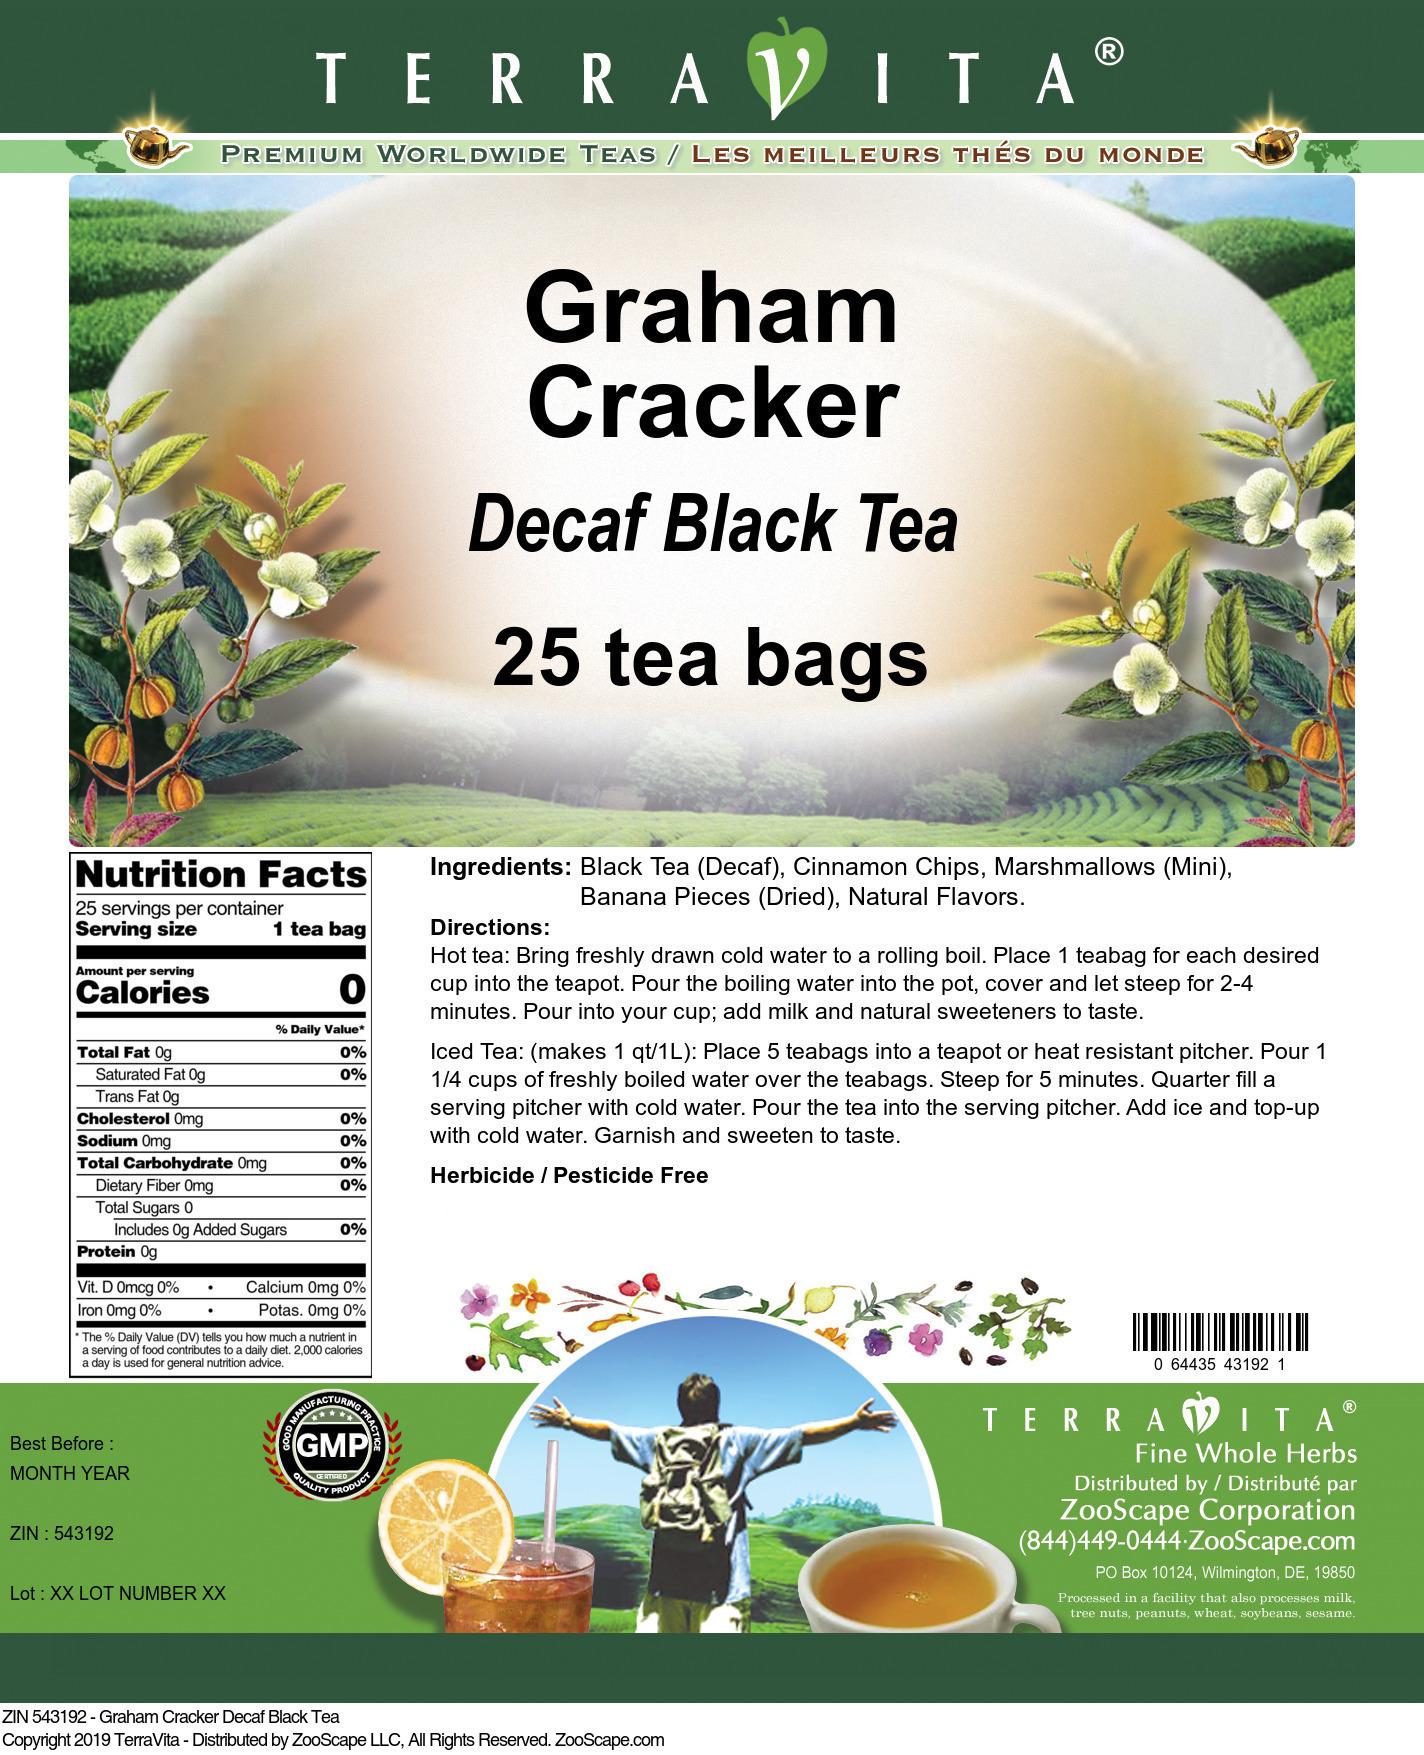 Graham Cracker Decaf Black Tea